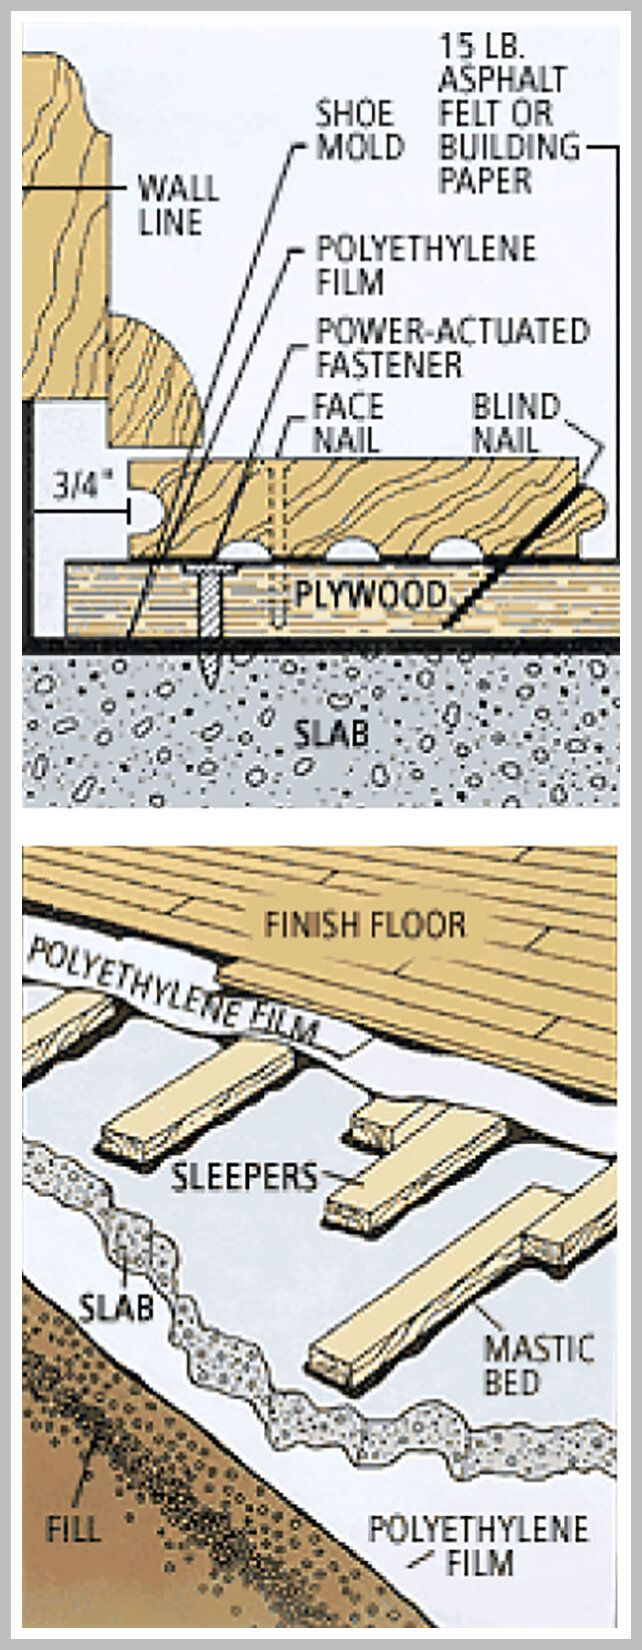 99 Reference Of Flooring Hard Wood Concrete Slab In 2020 Diy Wood Floors Installing Hardwood Floors Wood Floor Installation